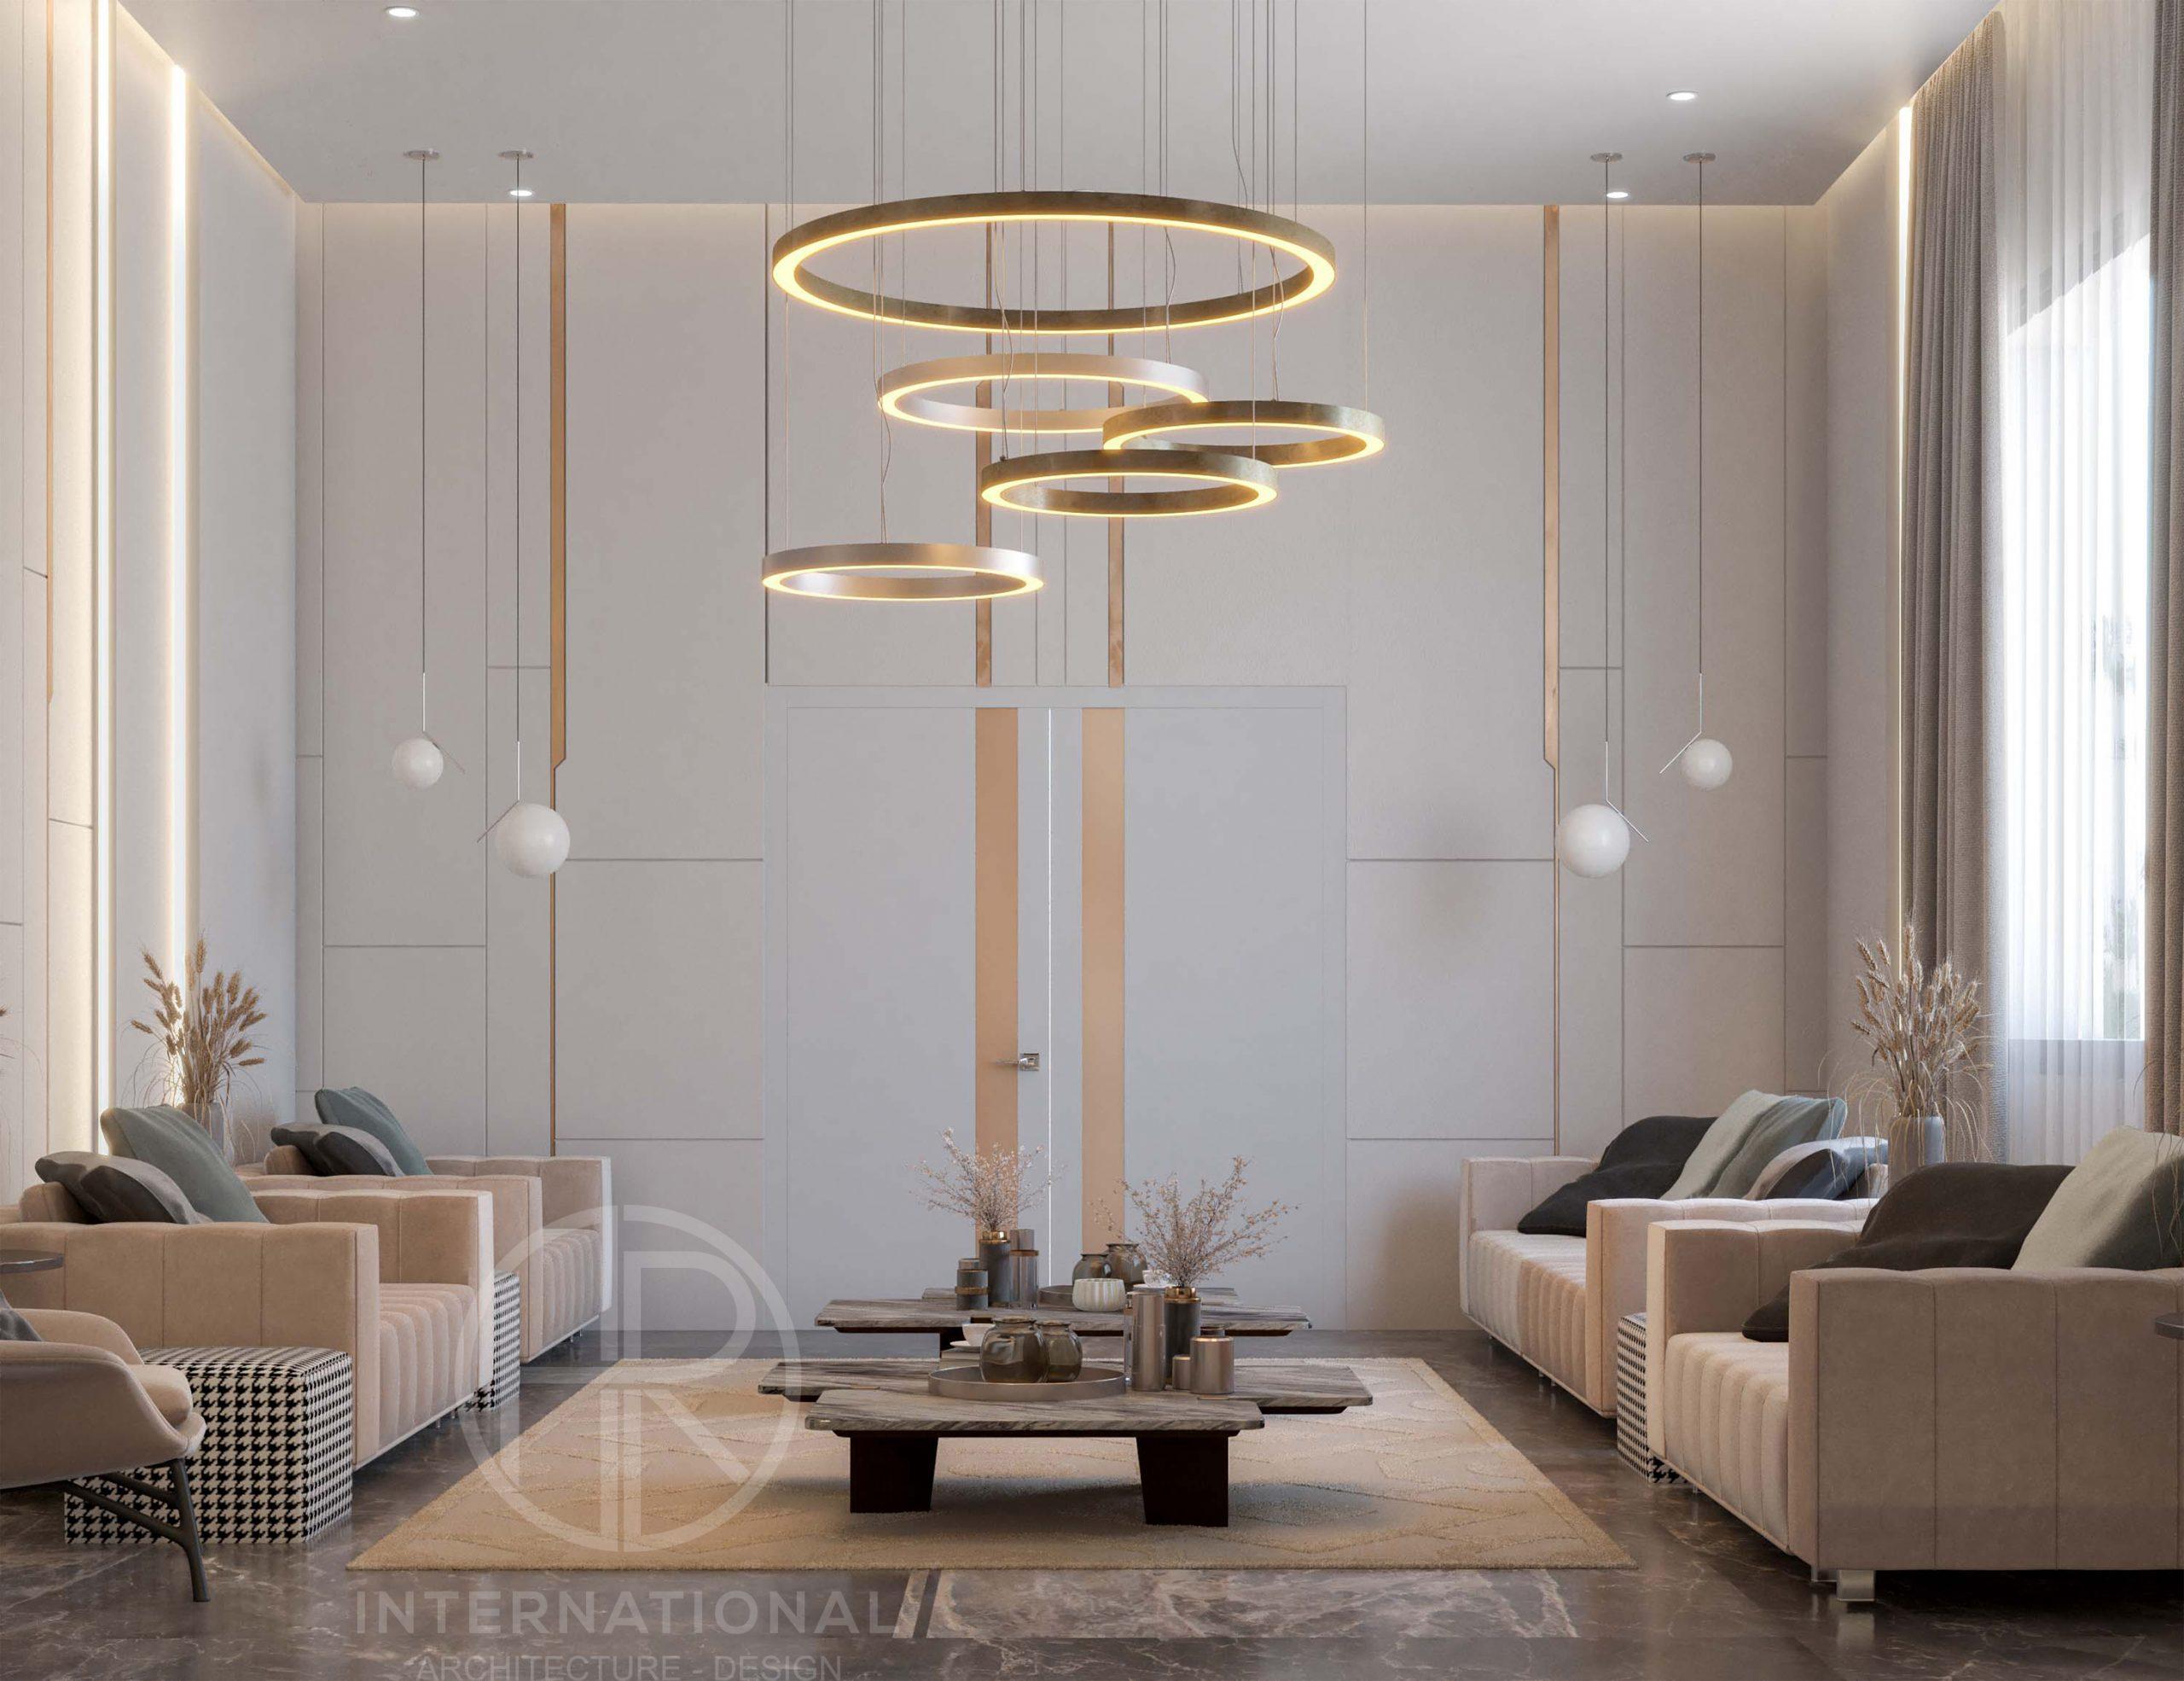 SOFT MOOD MEN'S MAJLES - circle light - golden lighting - door -modern design